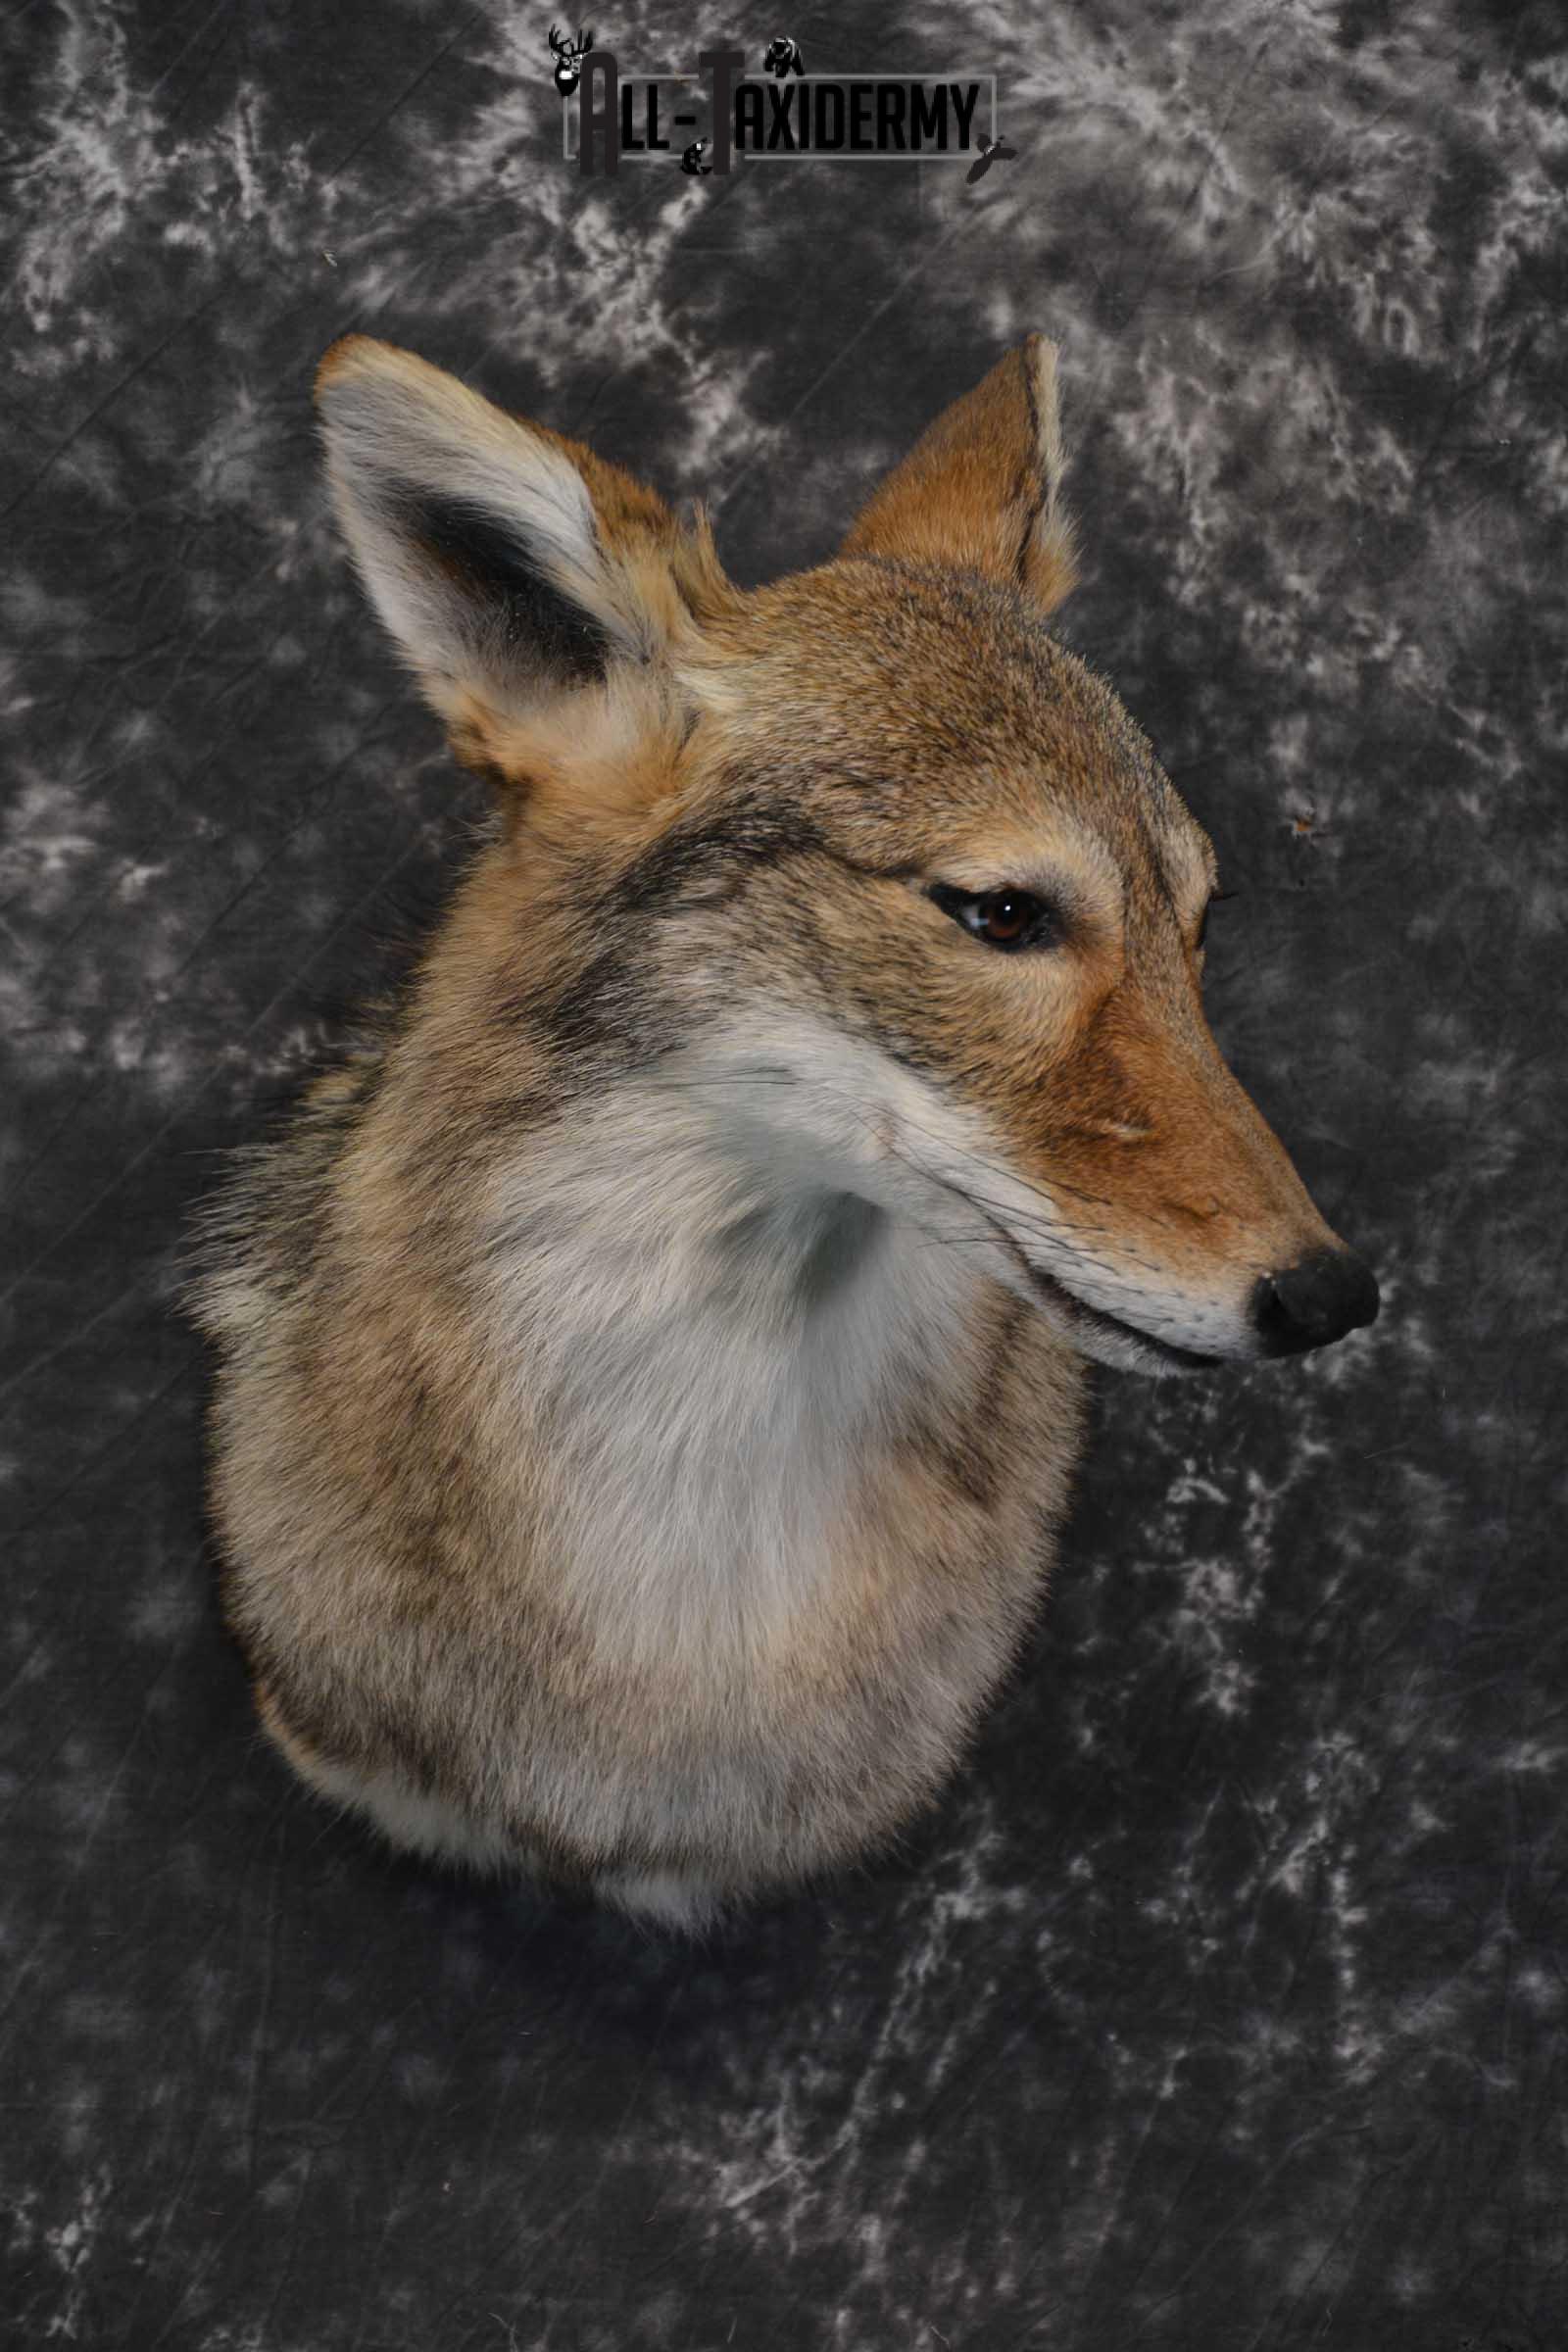 Coyote Taxidermy Shoulder Mount for sale SKU 1809